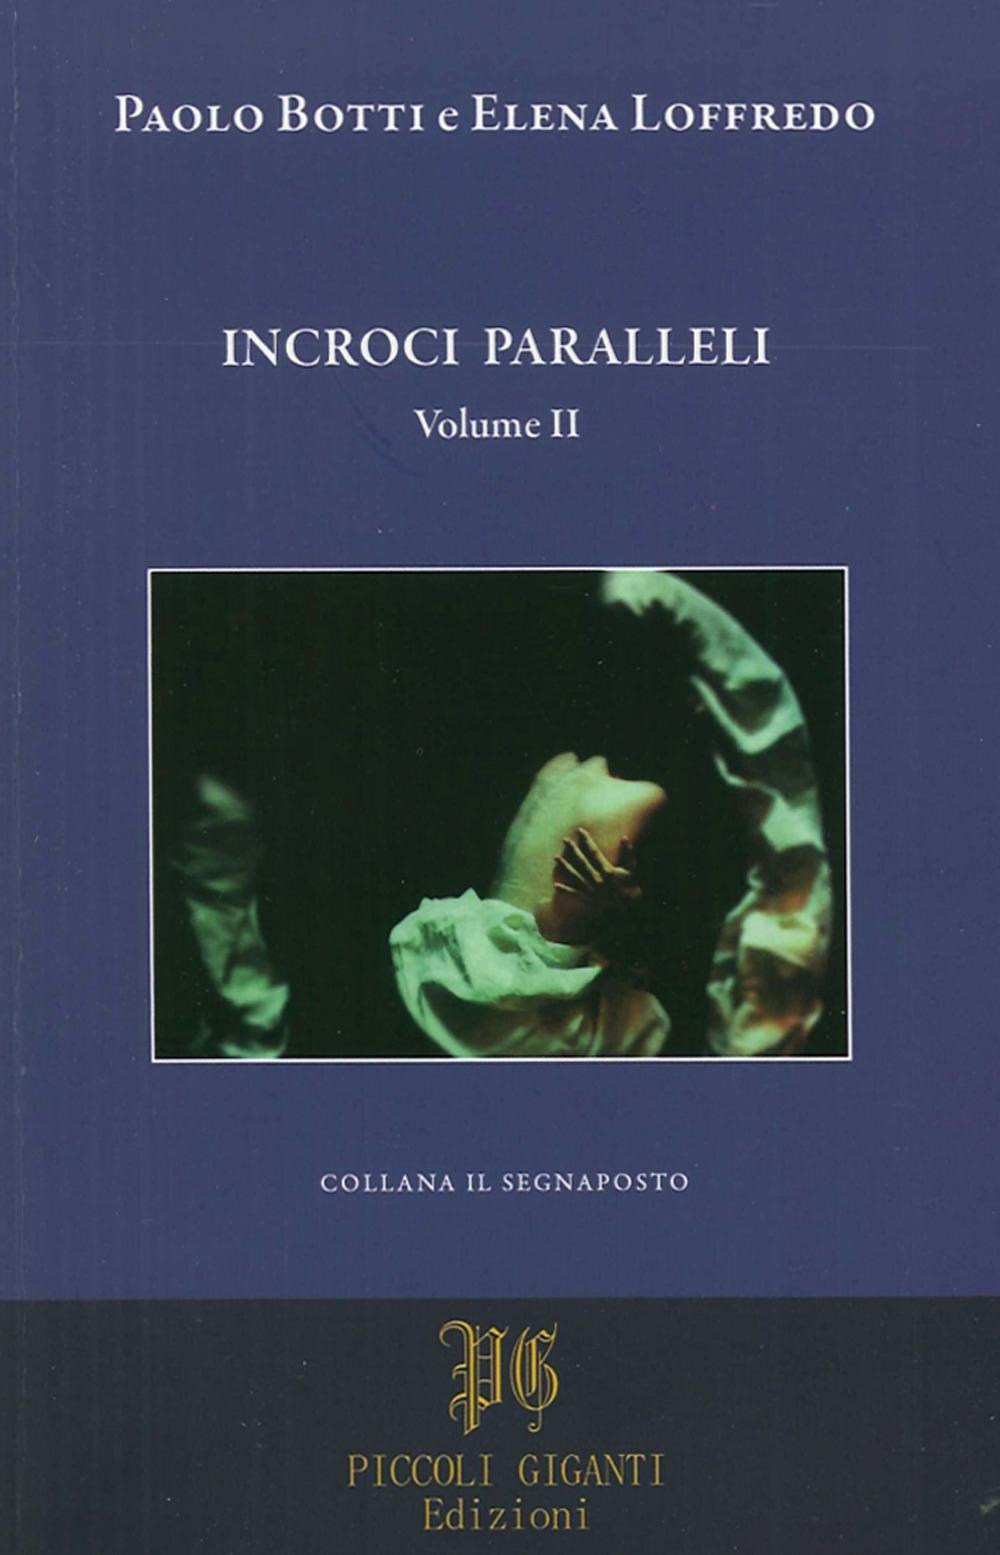 Incroci Paralleli. Volume II